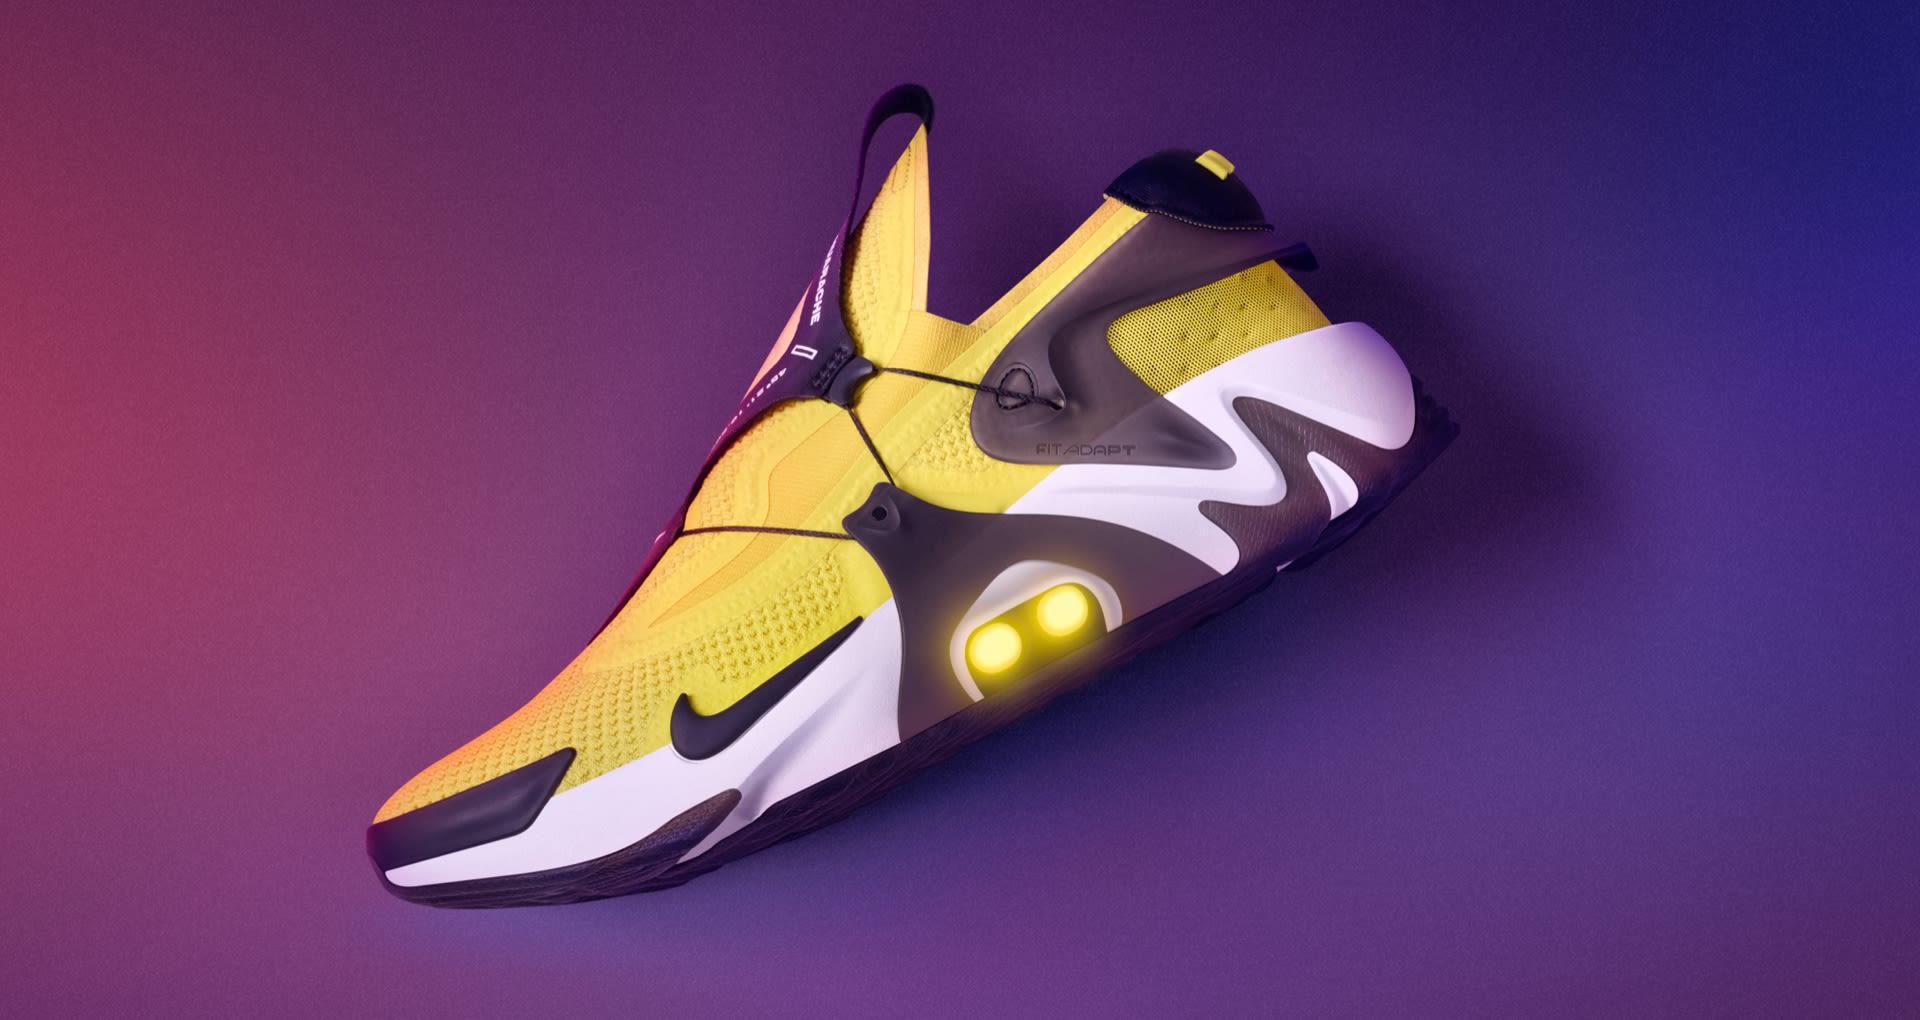 Date de sortie de la Nike Adapt Huarache « Opti Yellow